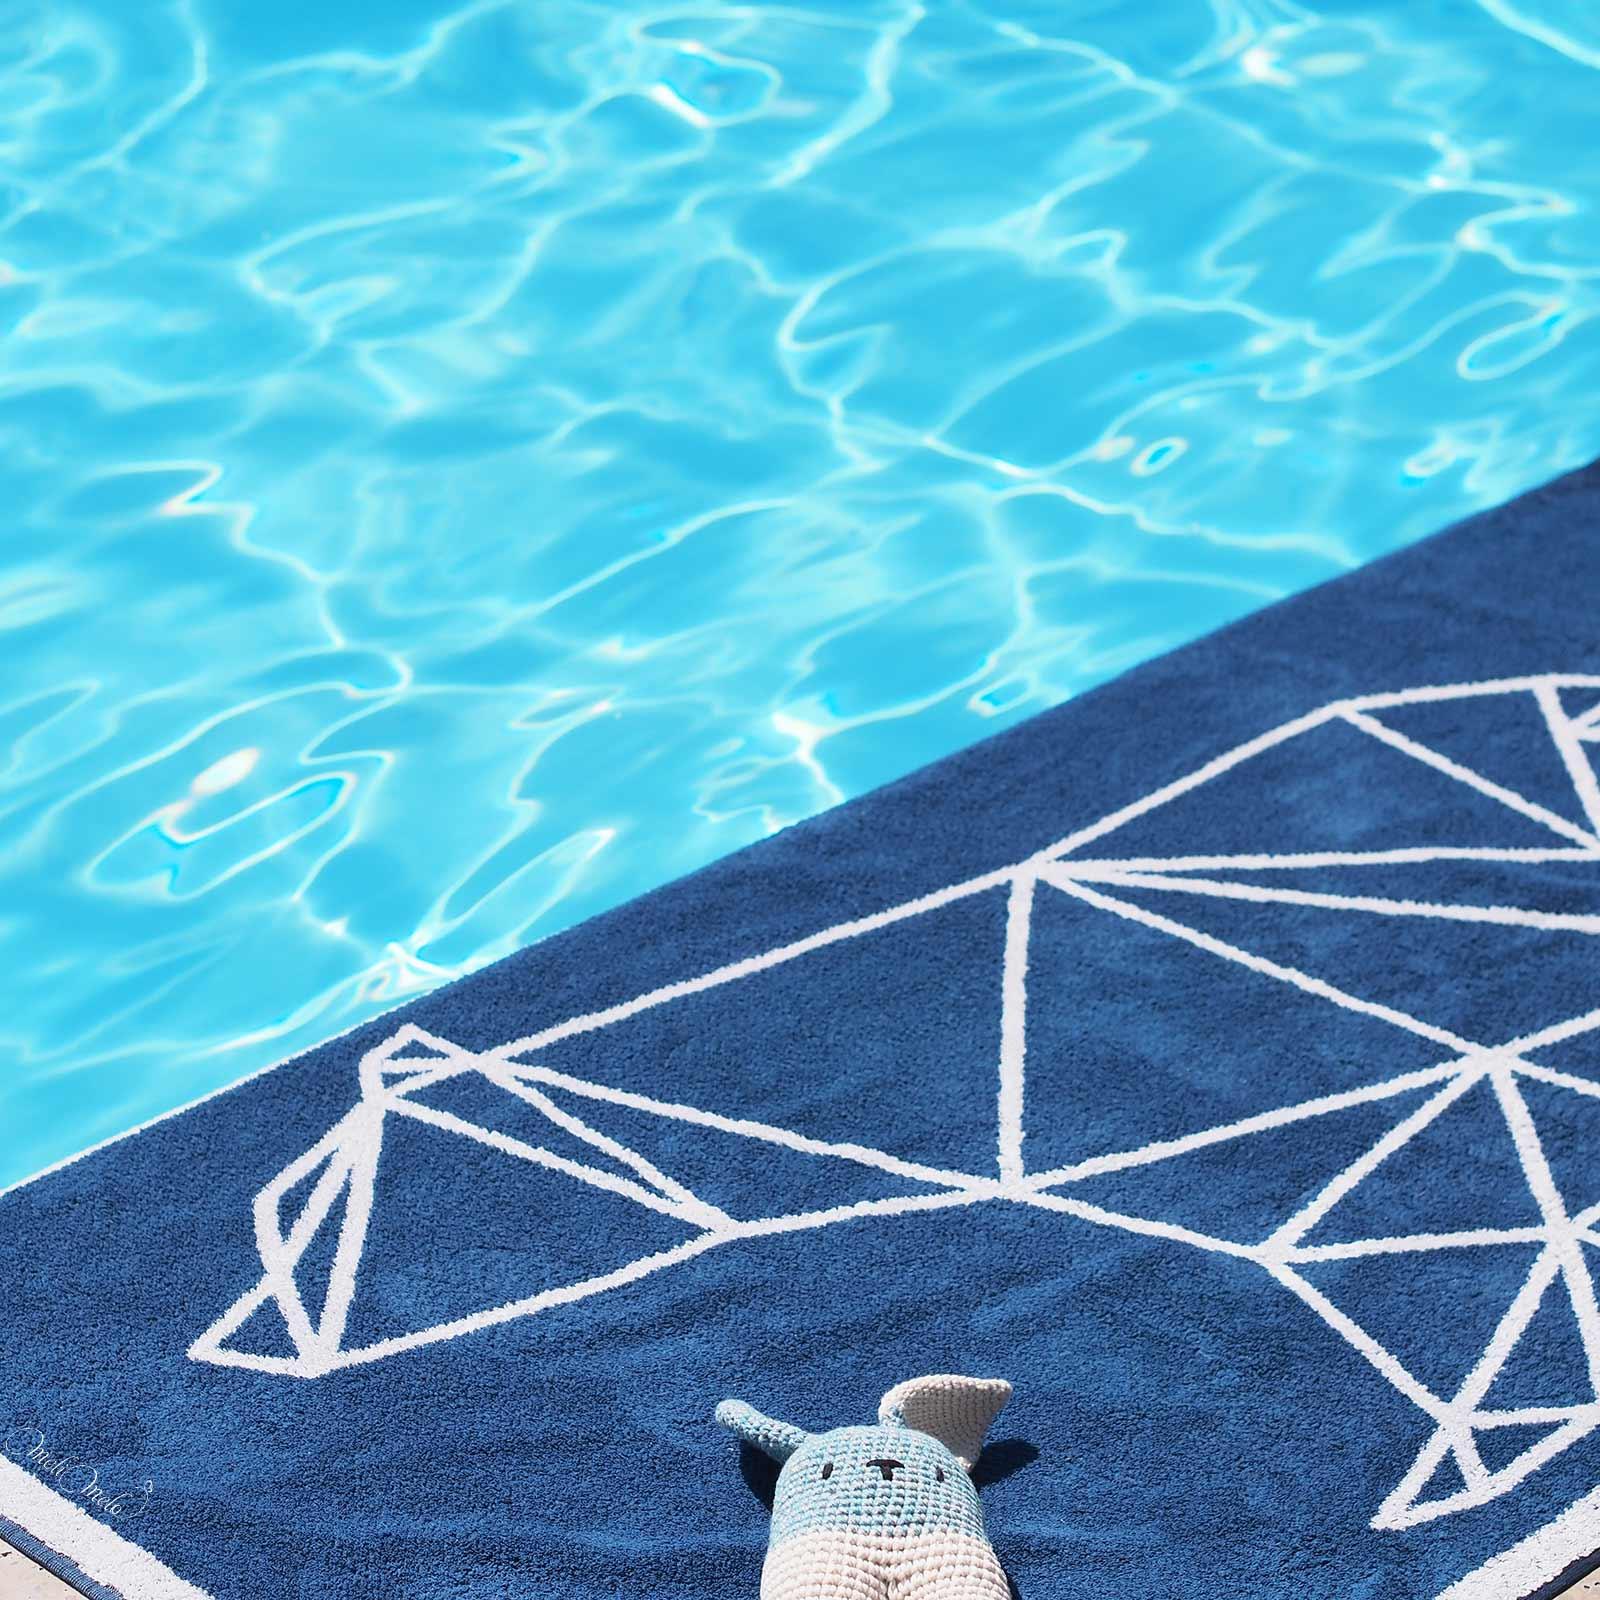 crochet lapin lanukas conejo bipedo towel pool hawkeandthorn laboutiquedemelimelo